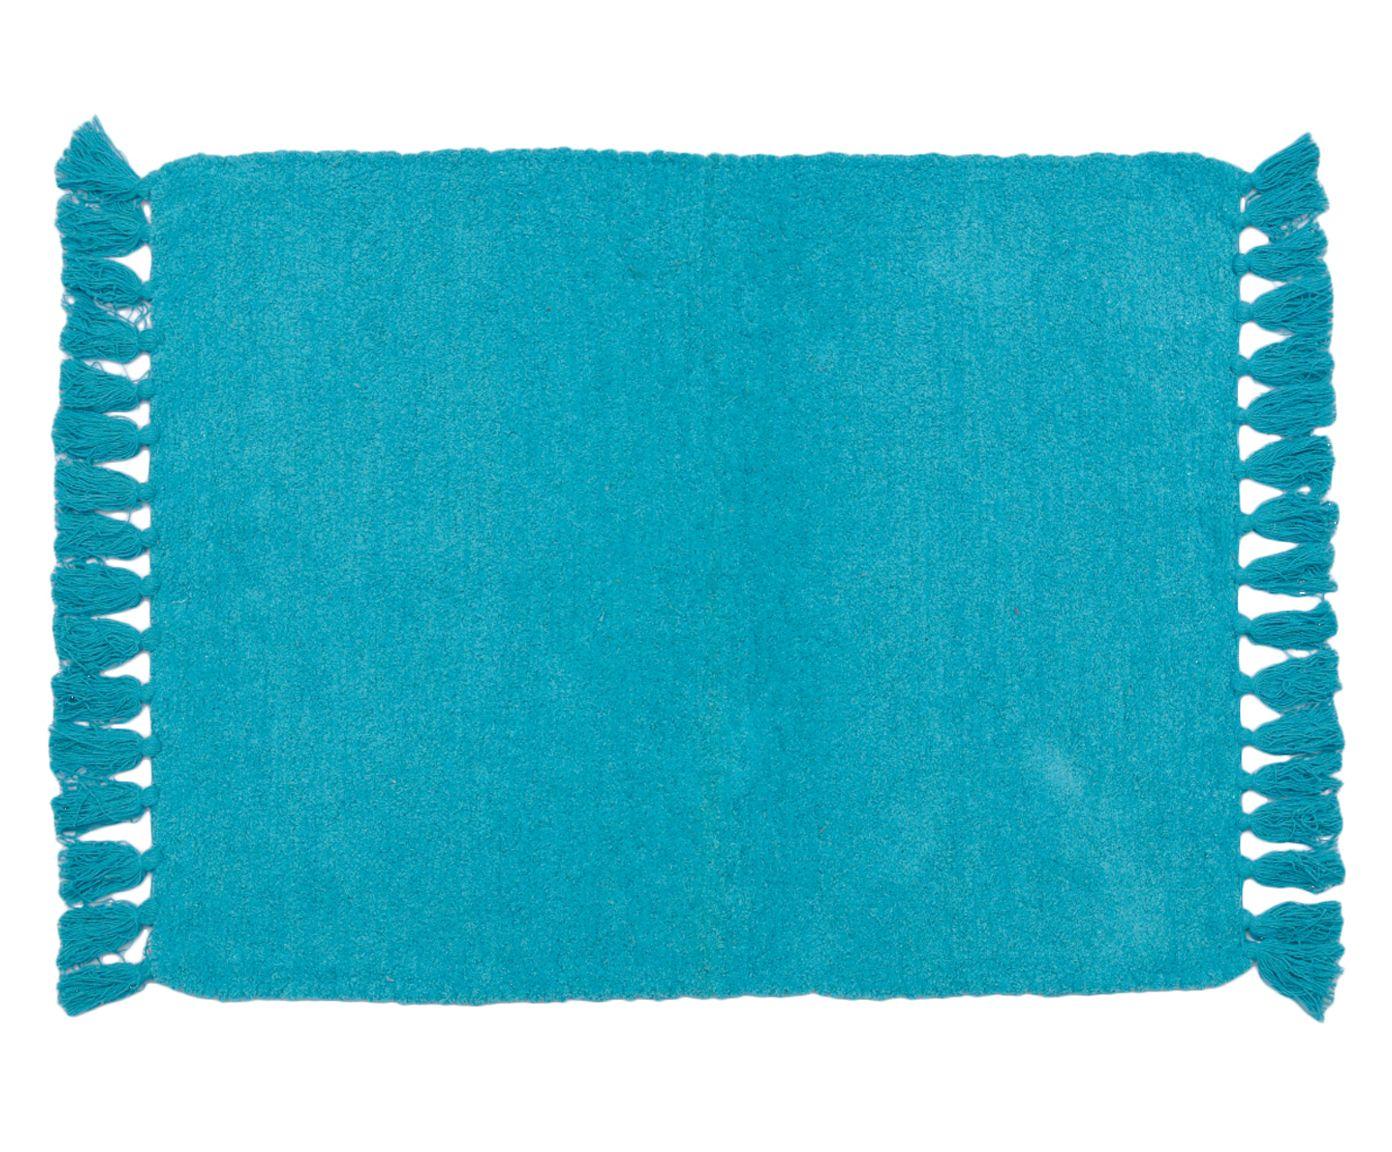 Tapete Indiano Vishnu Azul - 90x150cm   Westwing.com.br